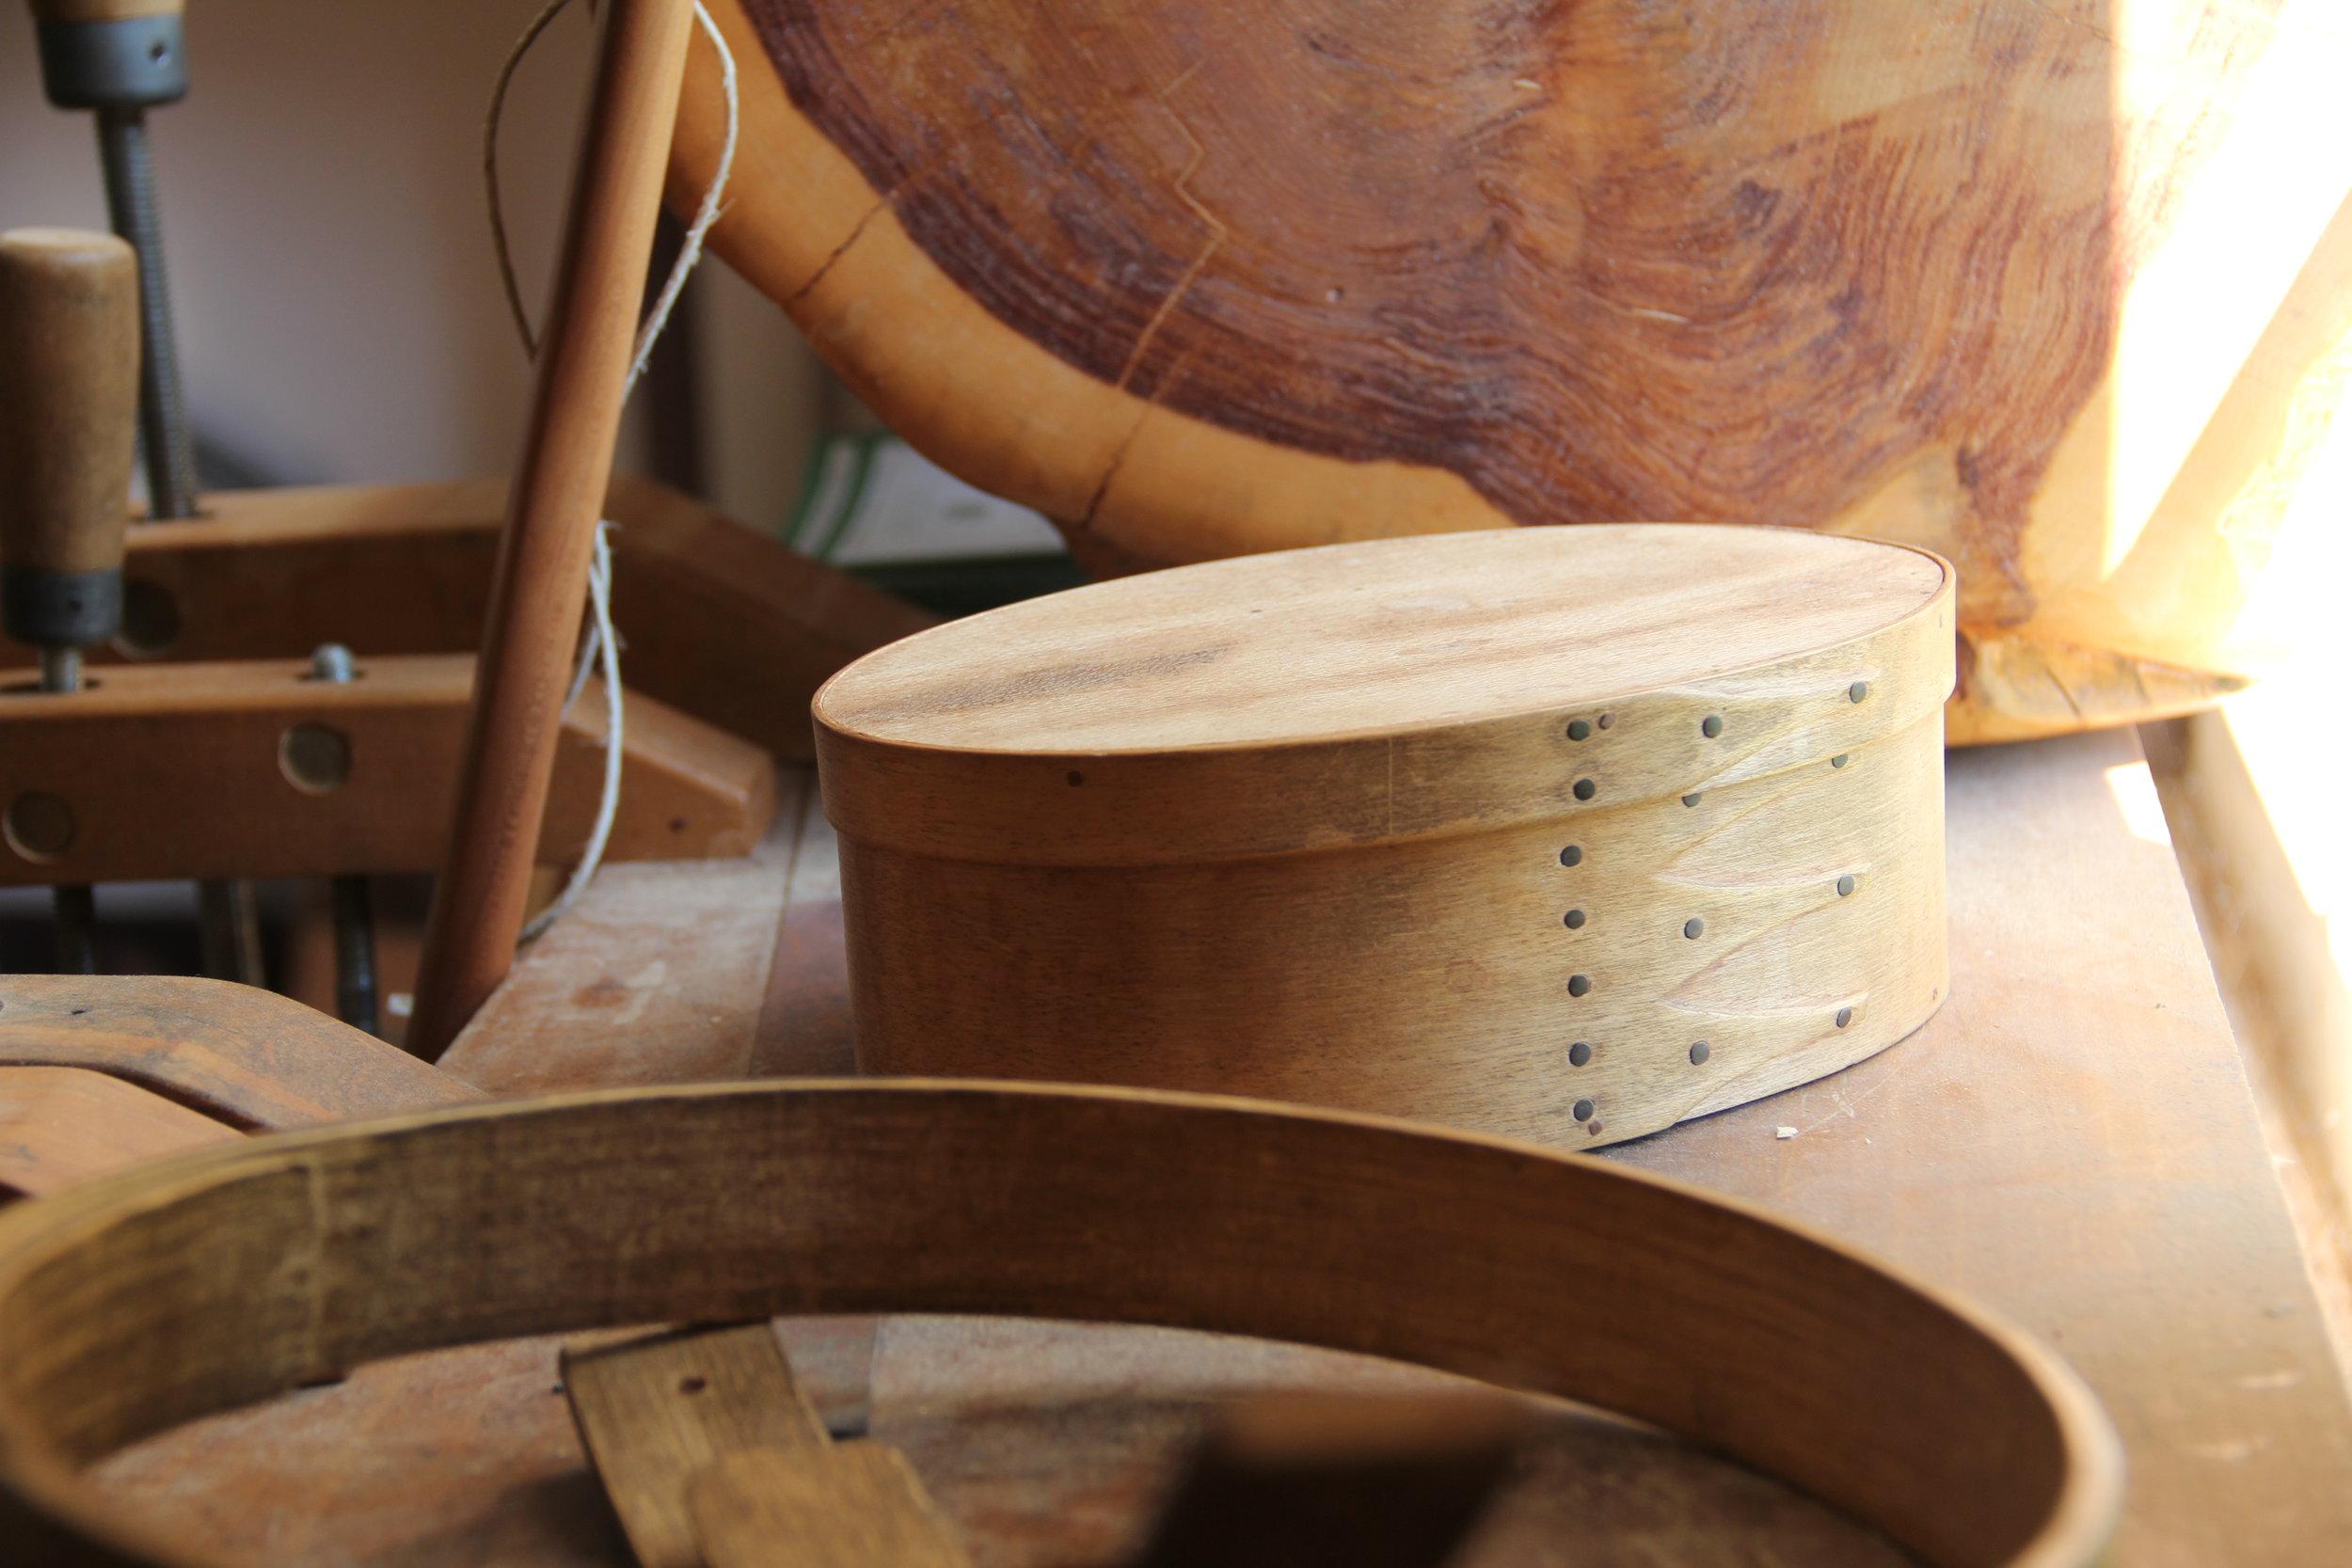 appalachian craft sale first methodist church cedar falls iowa